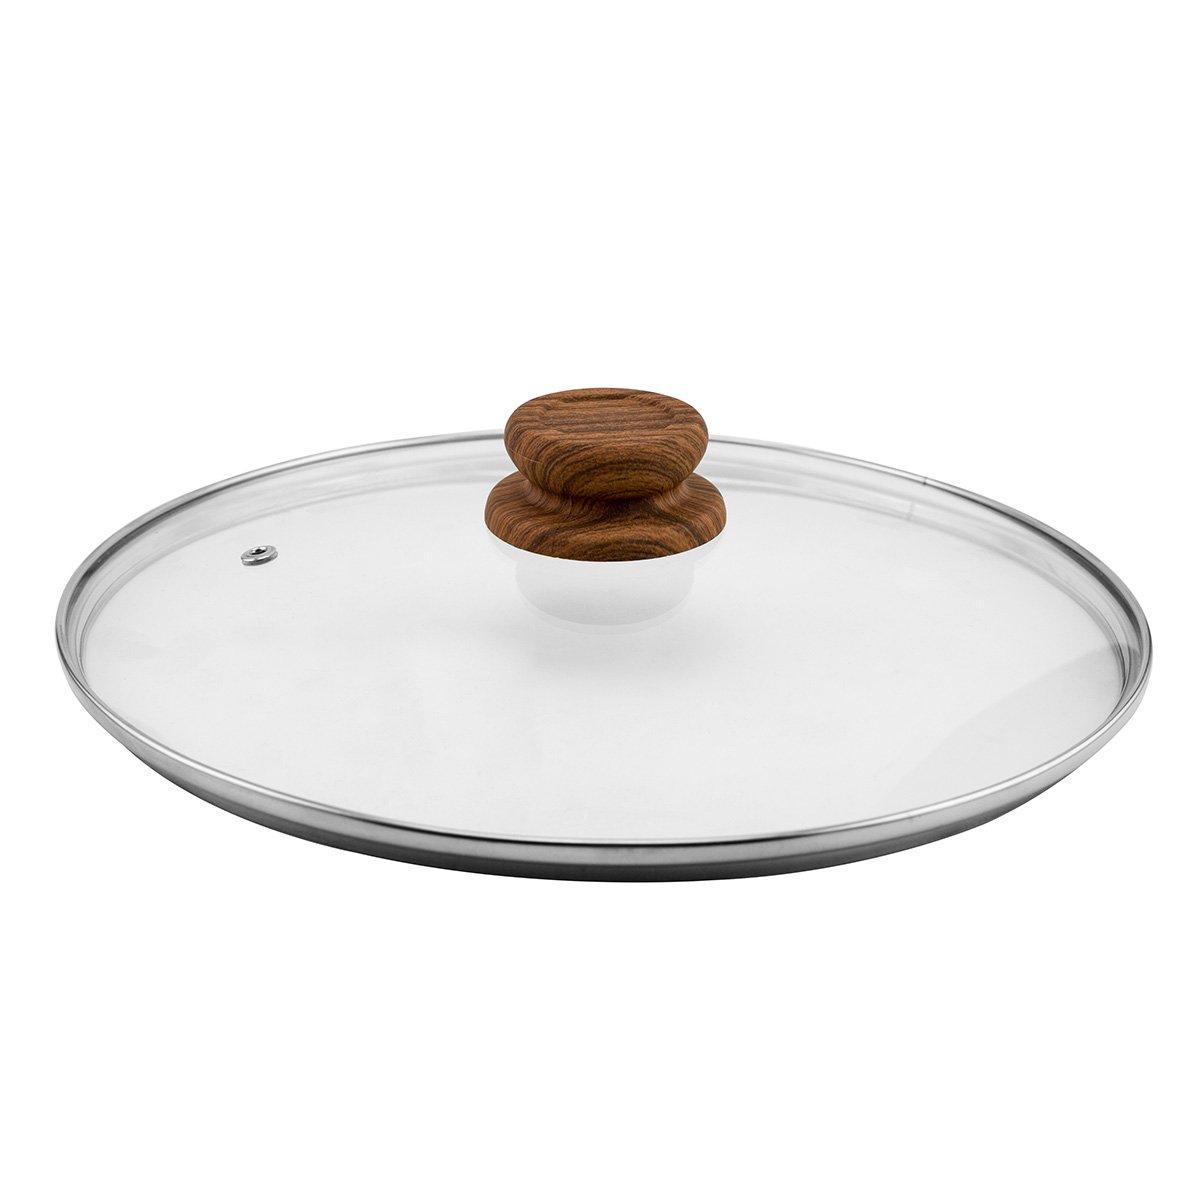 JML 28cm Domed Glass Ventilation & Steam Release Frying Pan Saucepan Lid